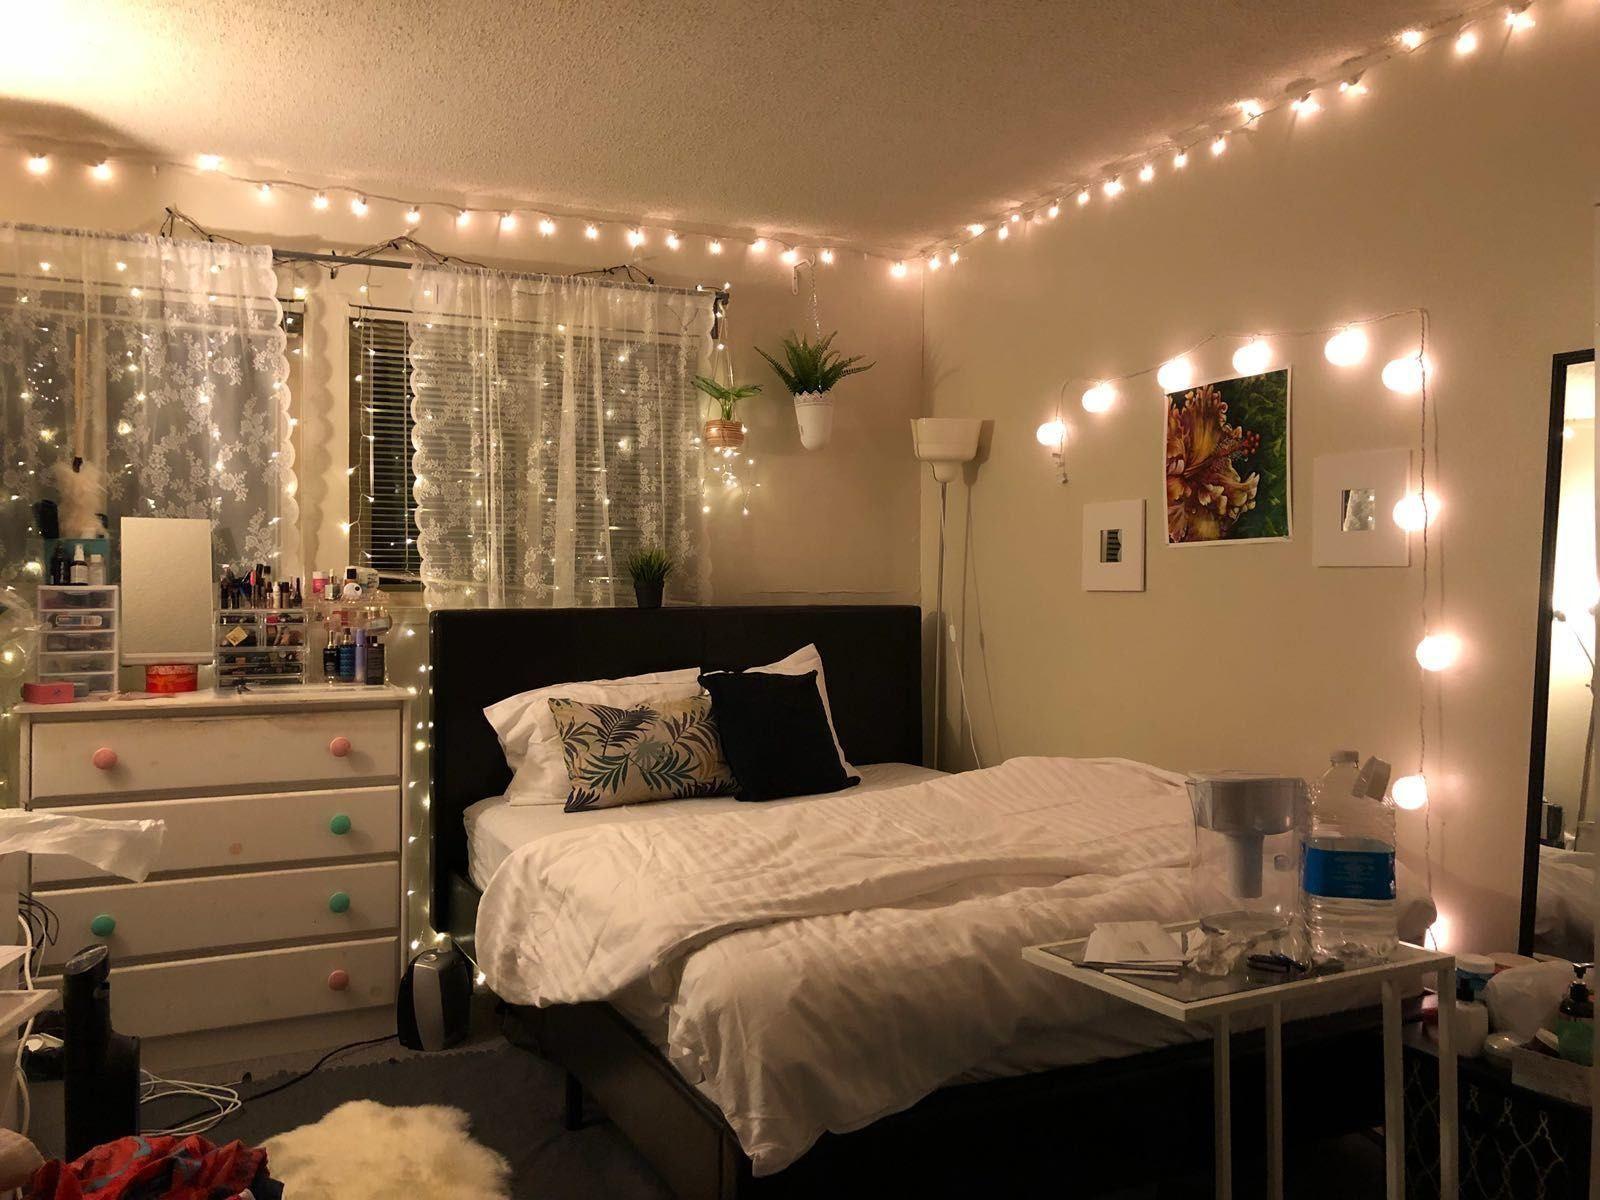 cute small bedroom ideas in 2020 cute room decor on cute lights for bedroom decorating ideas id=49013